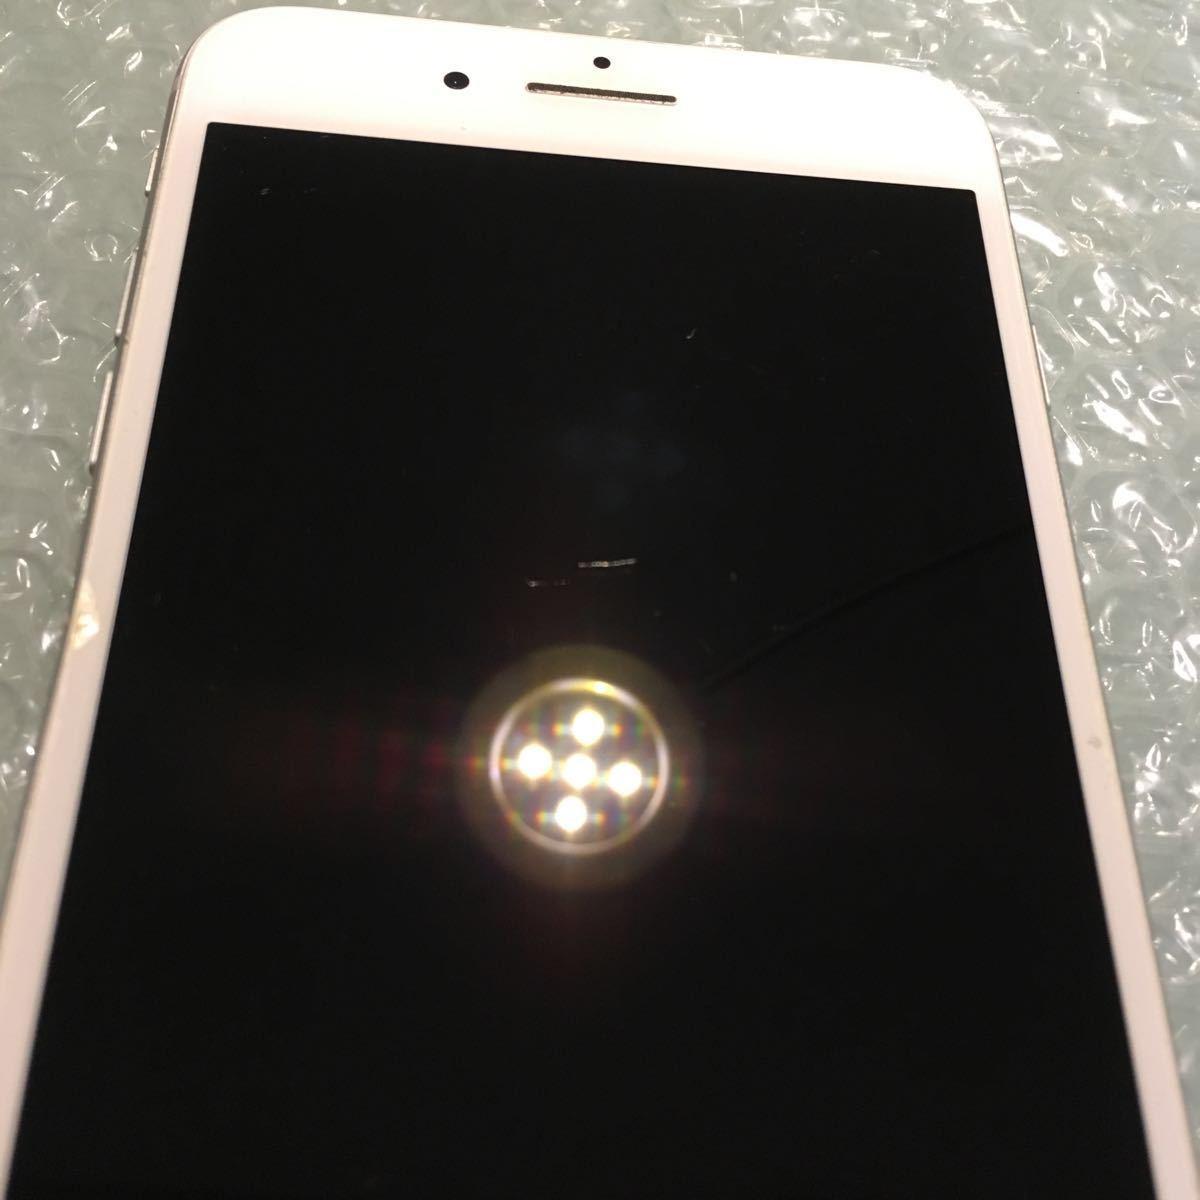 simフリー iphone 8 plus 64gb au simロック解除済み docomo softbank シルバー おまけ レザーケース付き_画像7